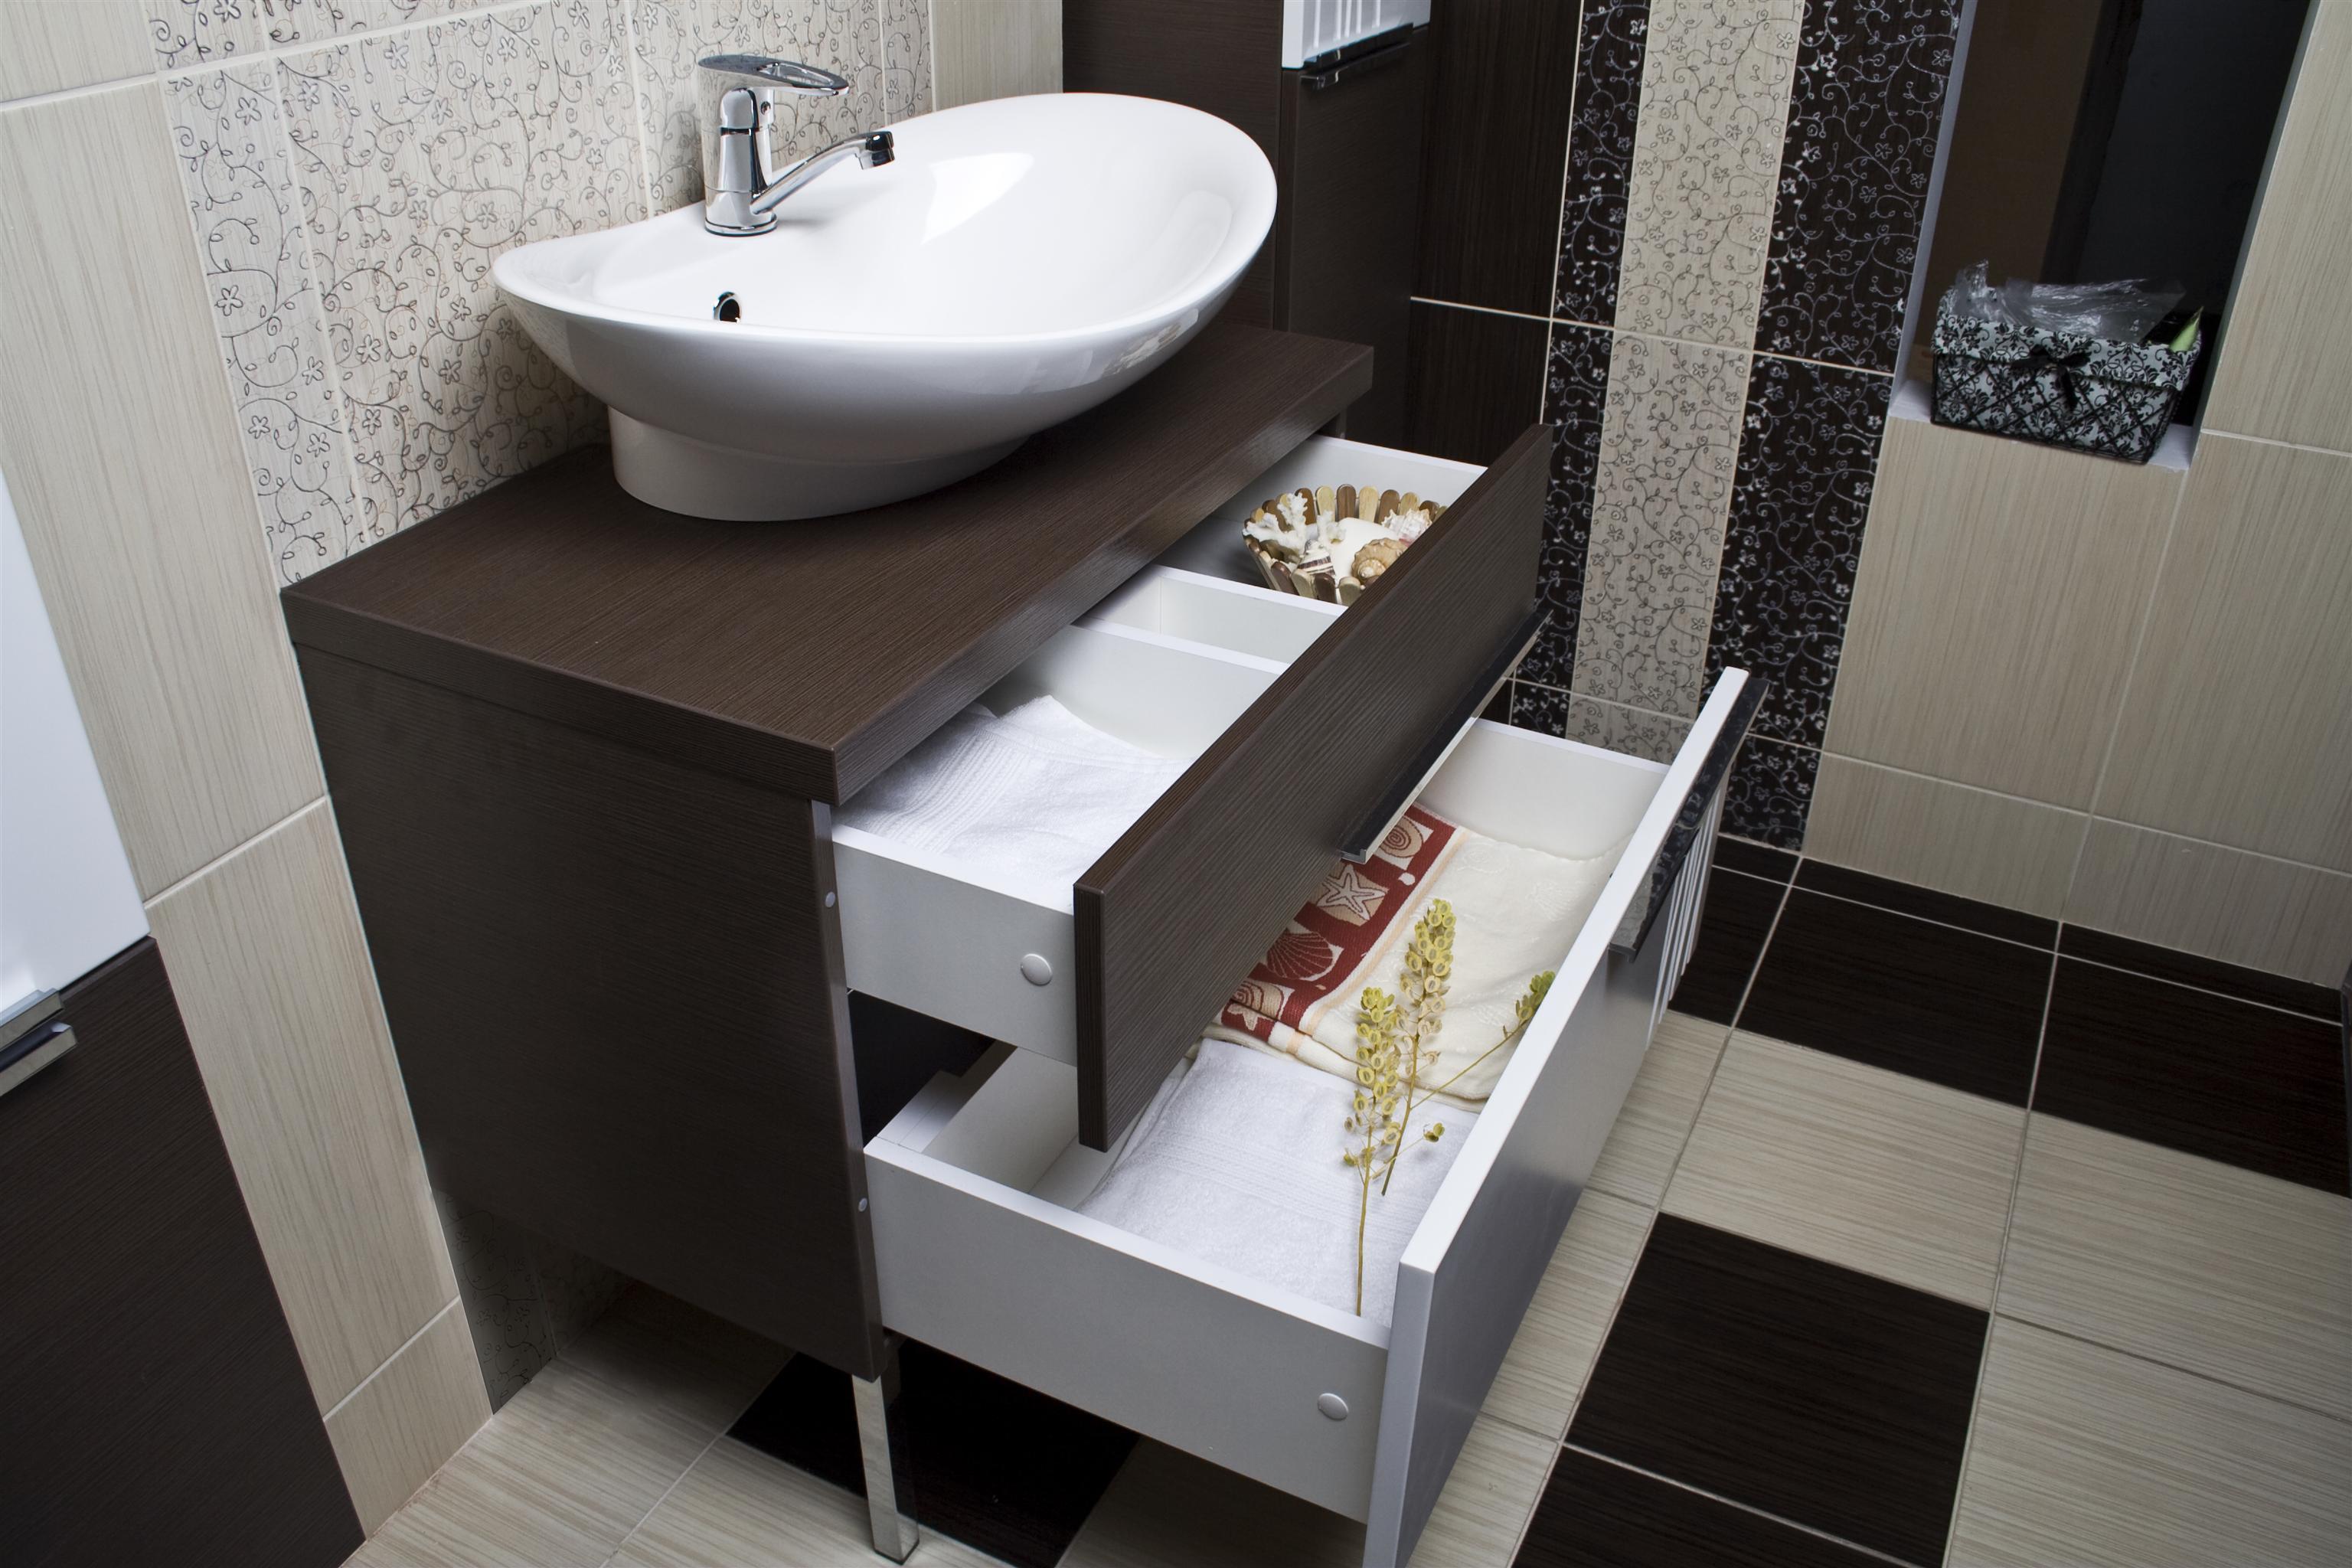 Раковина для ванной комнаты фото